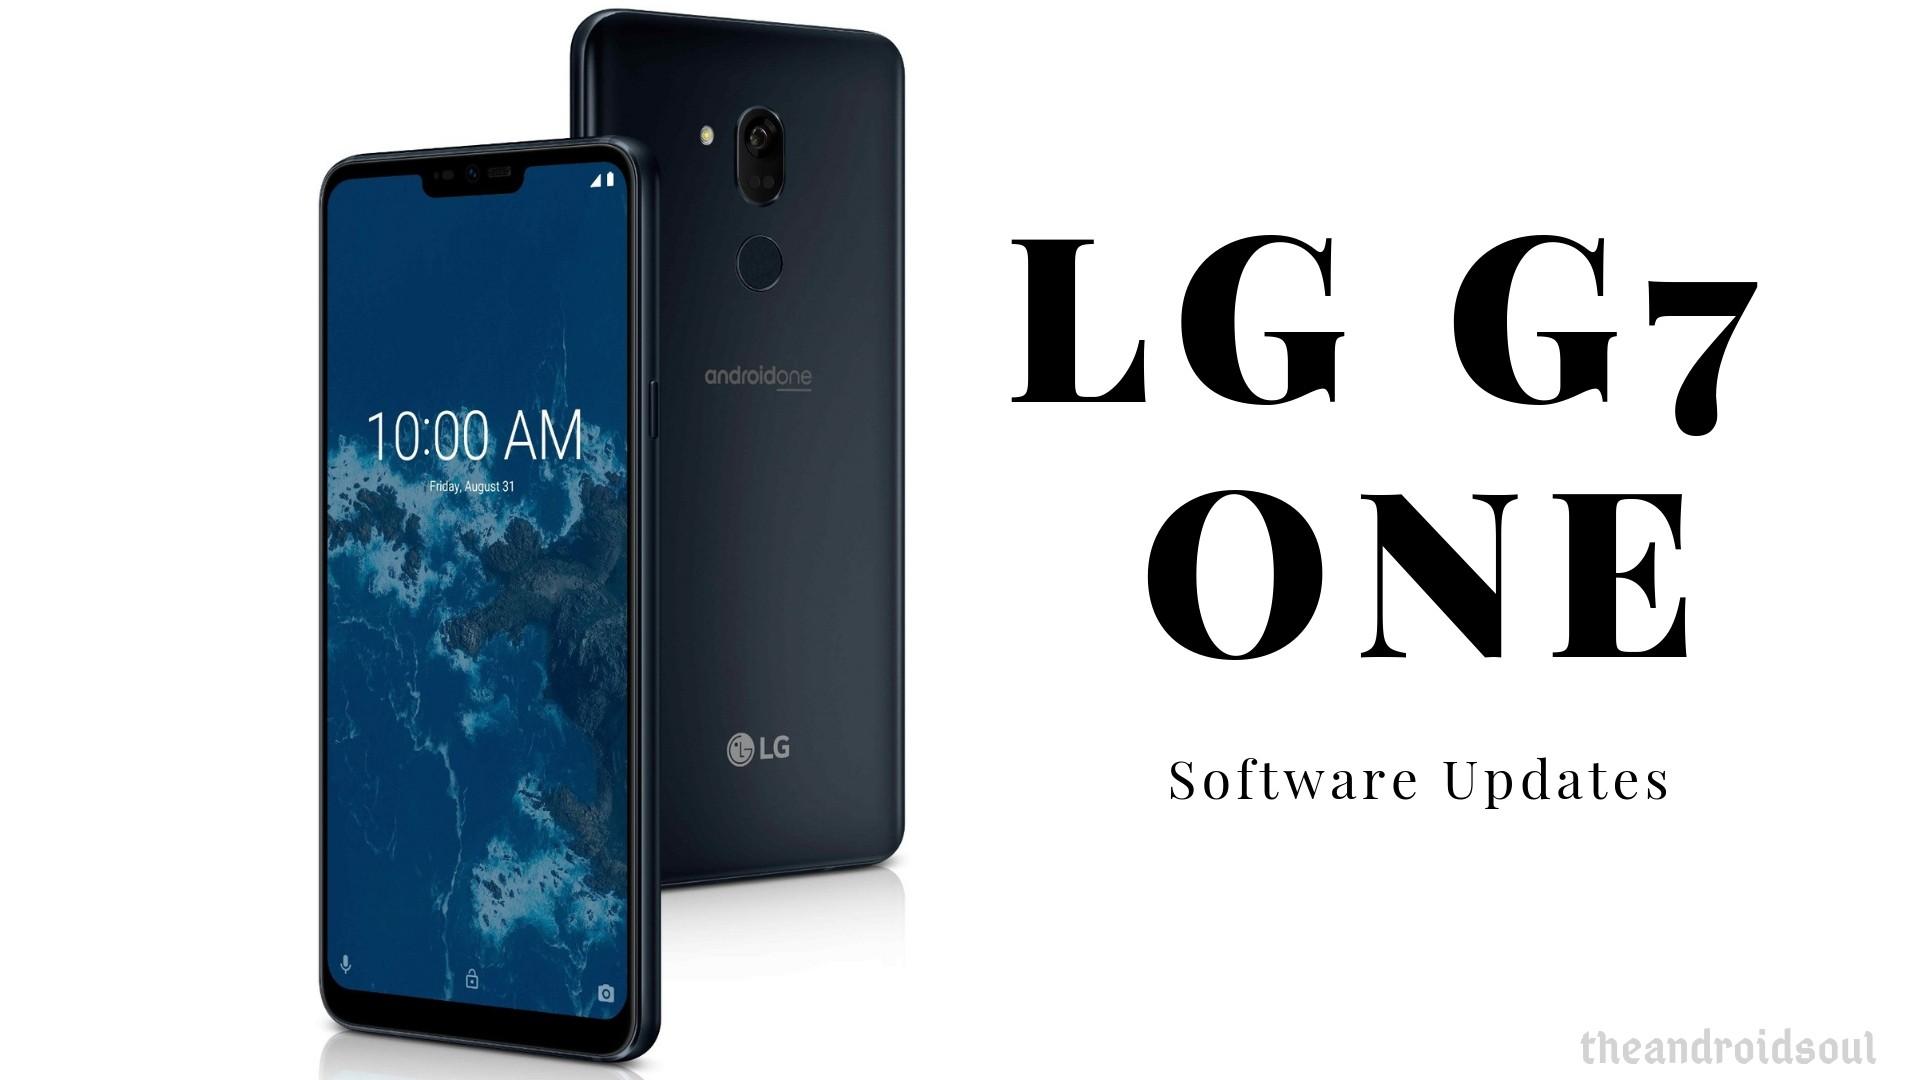 LG G7 One software updates